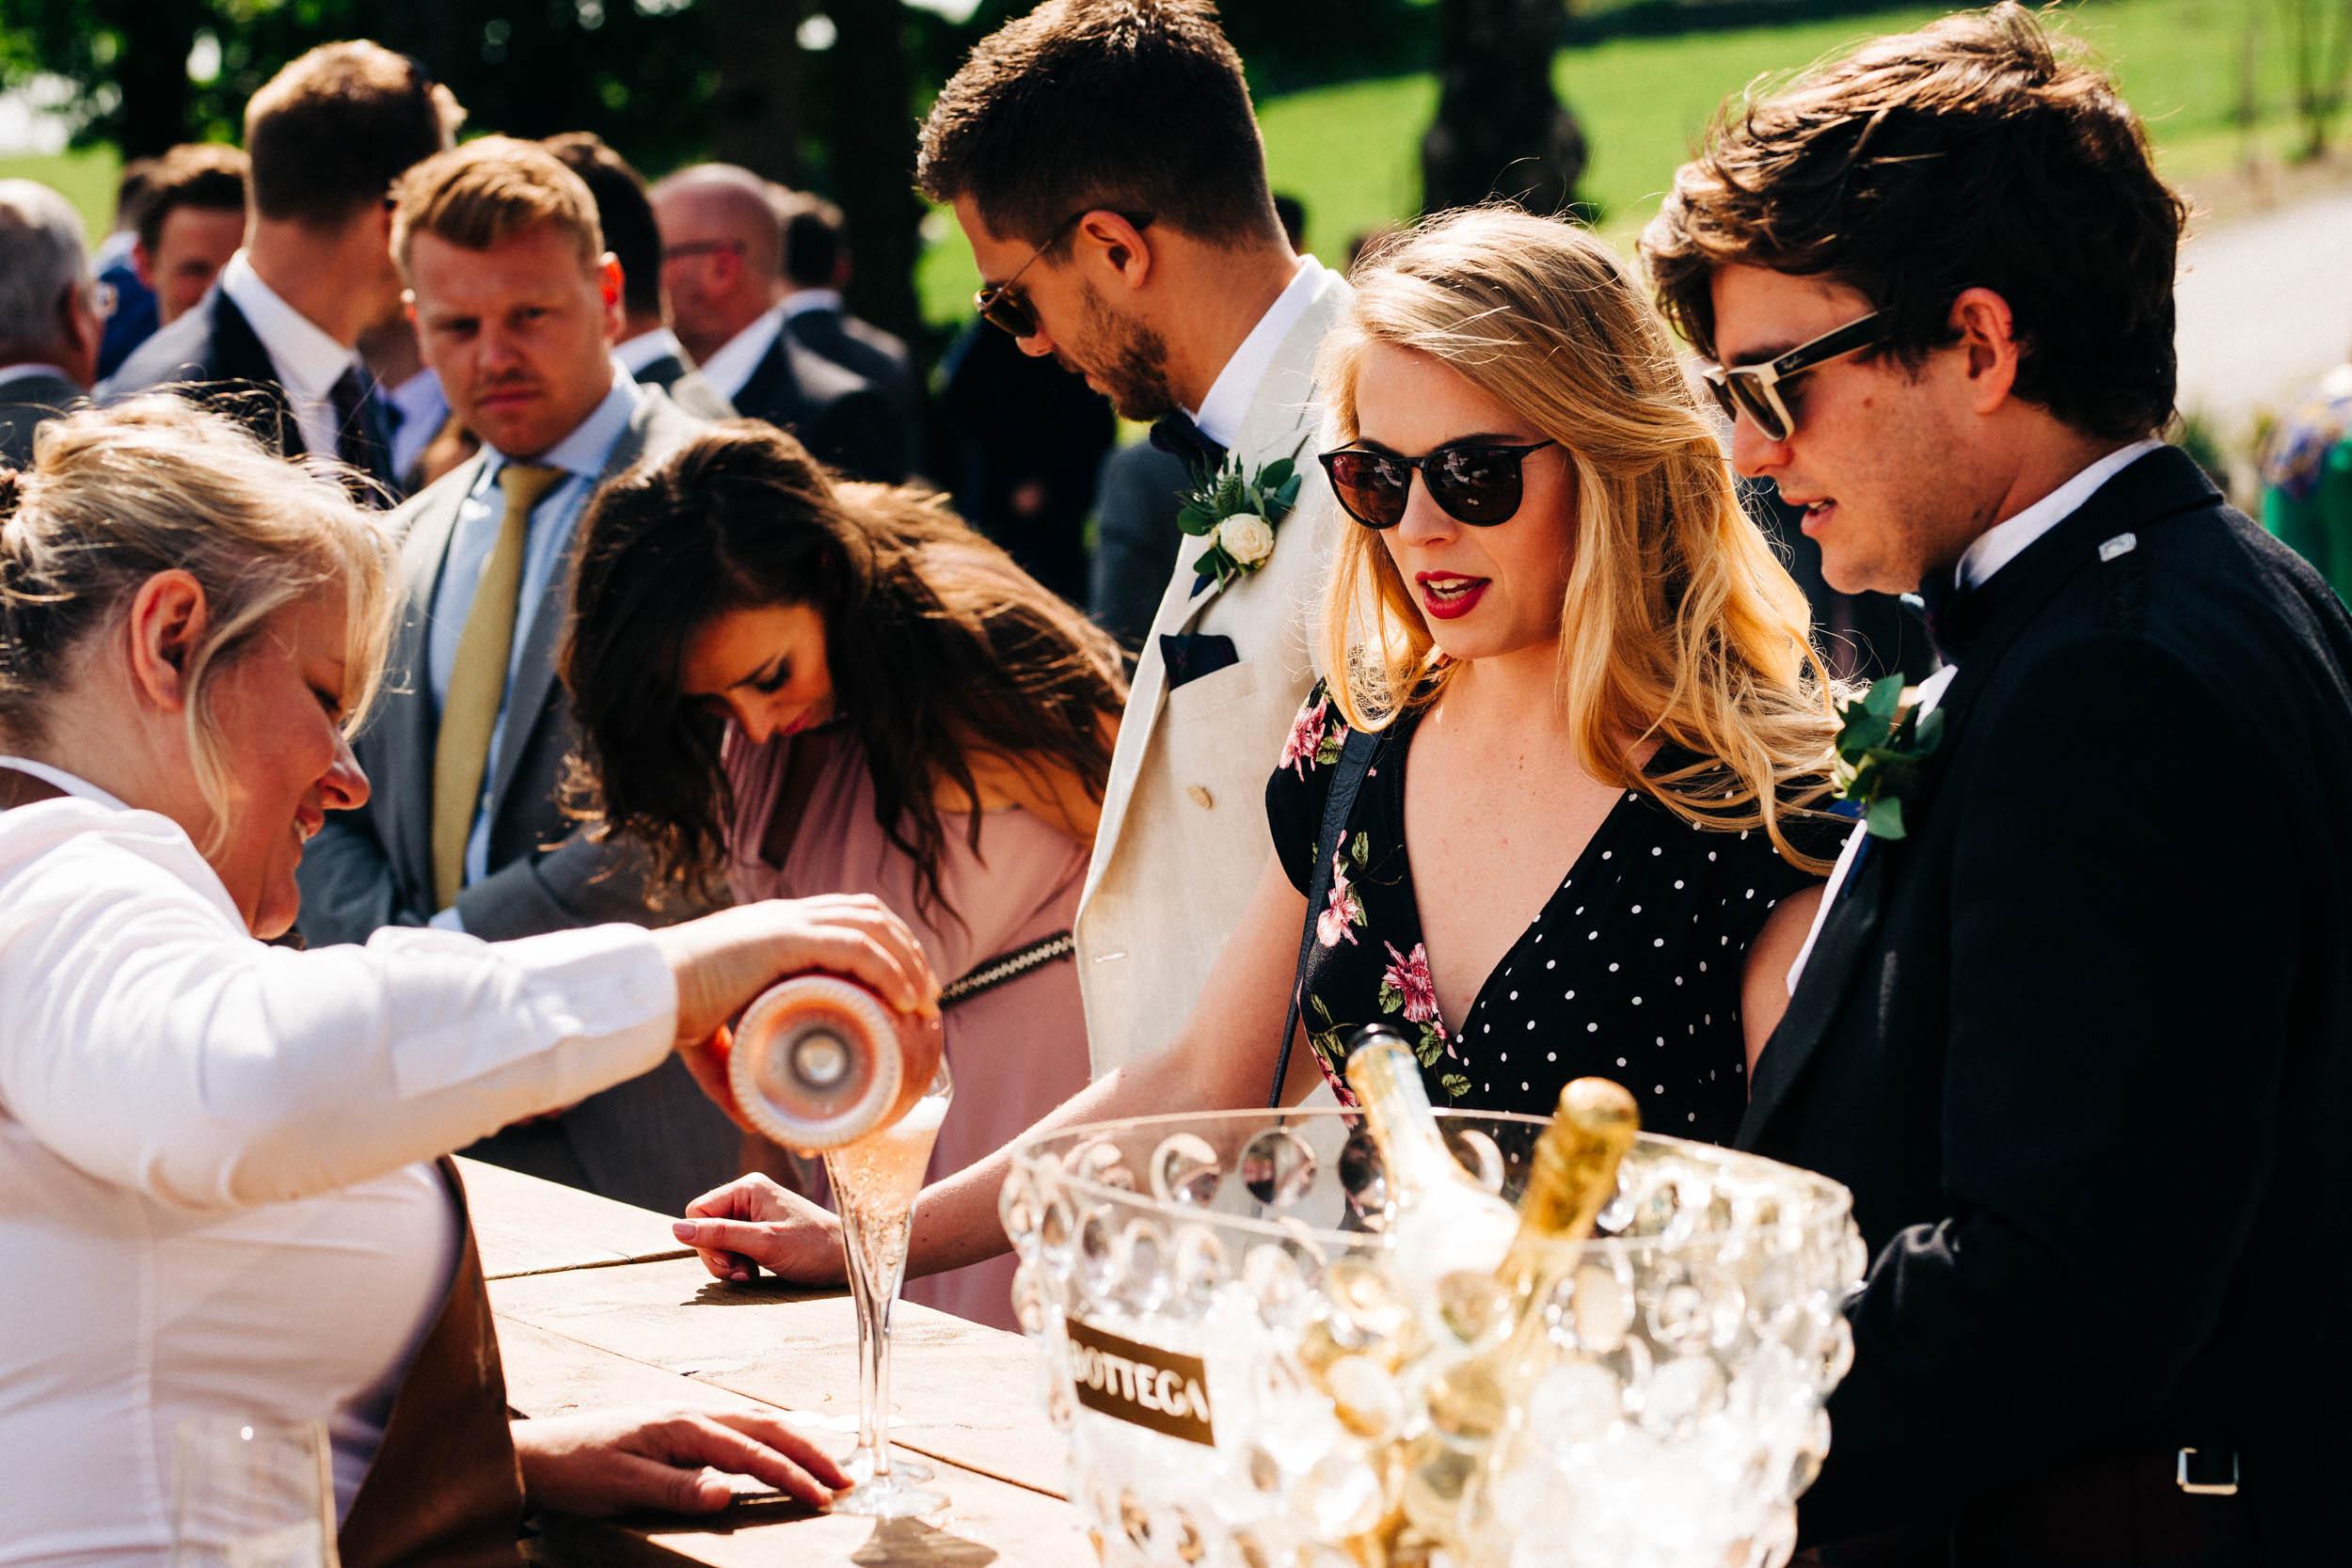 Alex_Sedgmond_Photography-SouthWalesWeddingPhotography-Wedding-Photographer-Cardiff-84.jpg